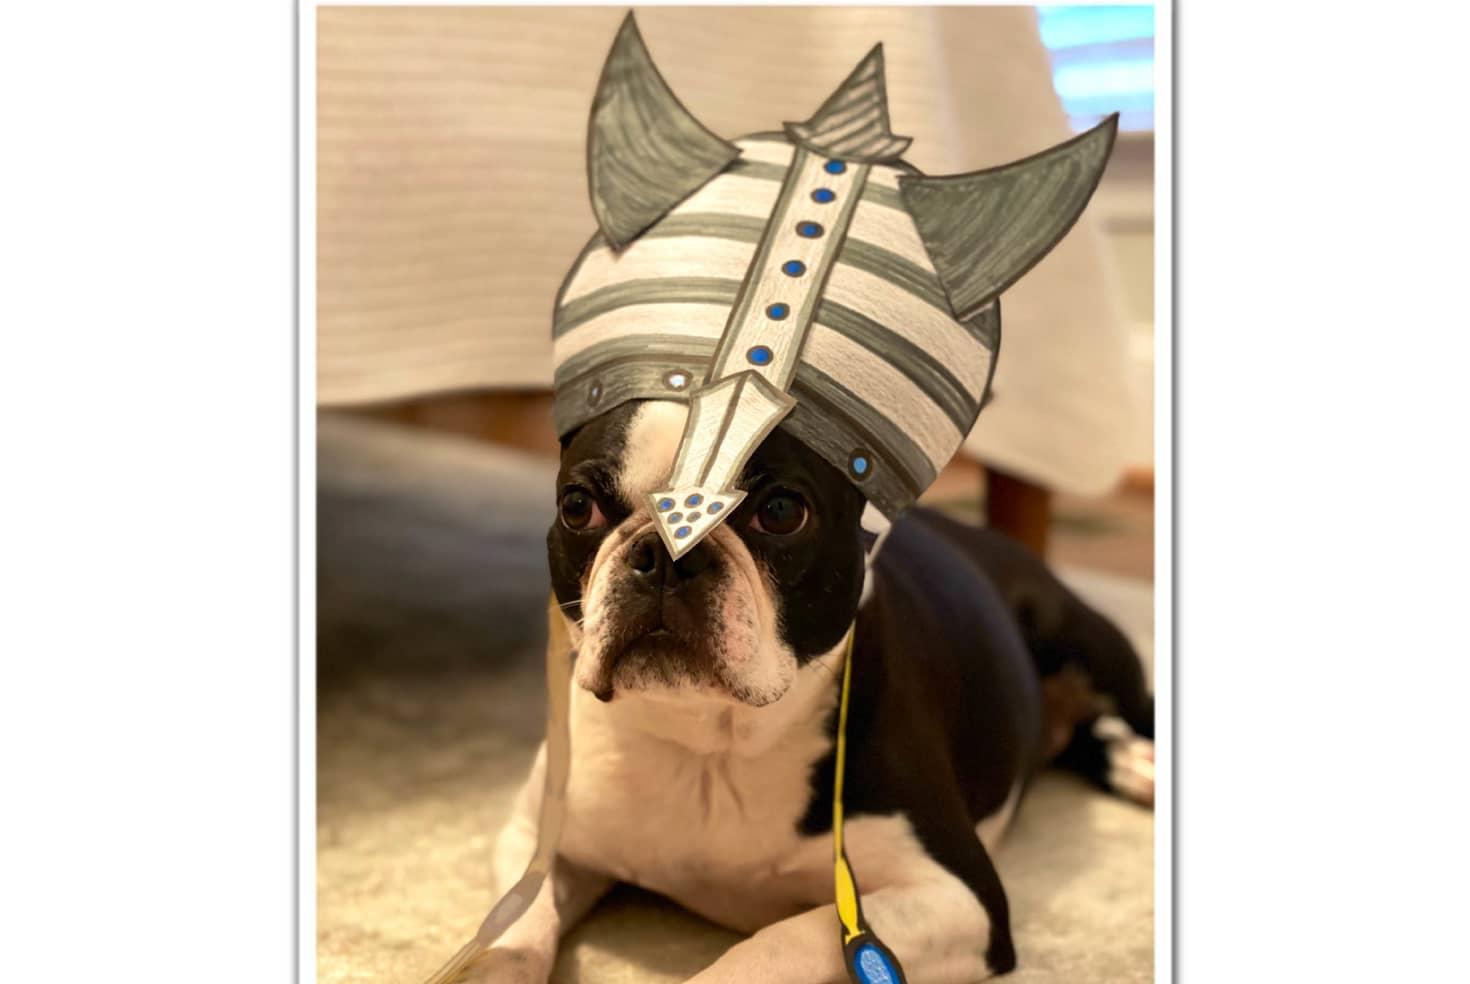 Make Your Own Opera Helmet 1